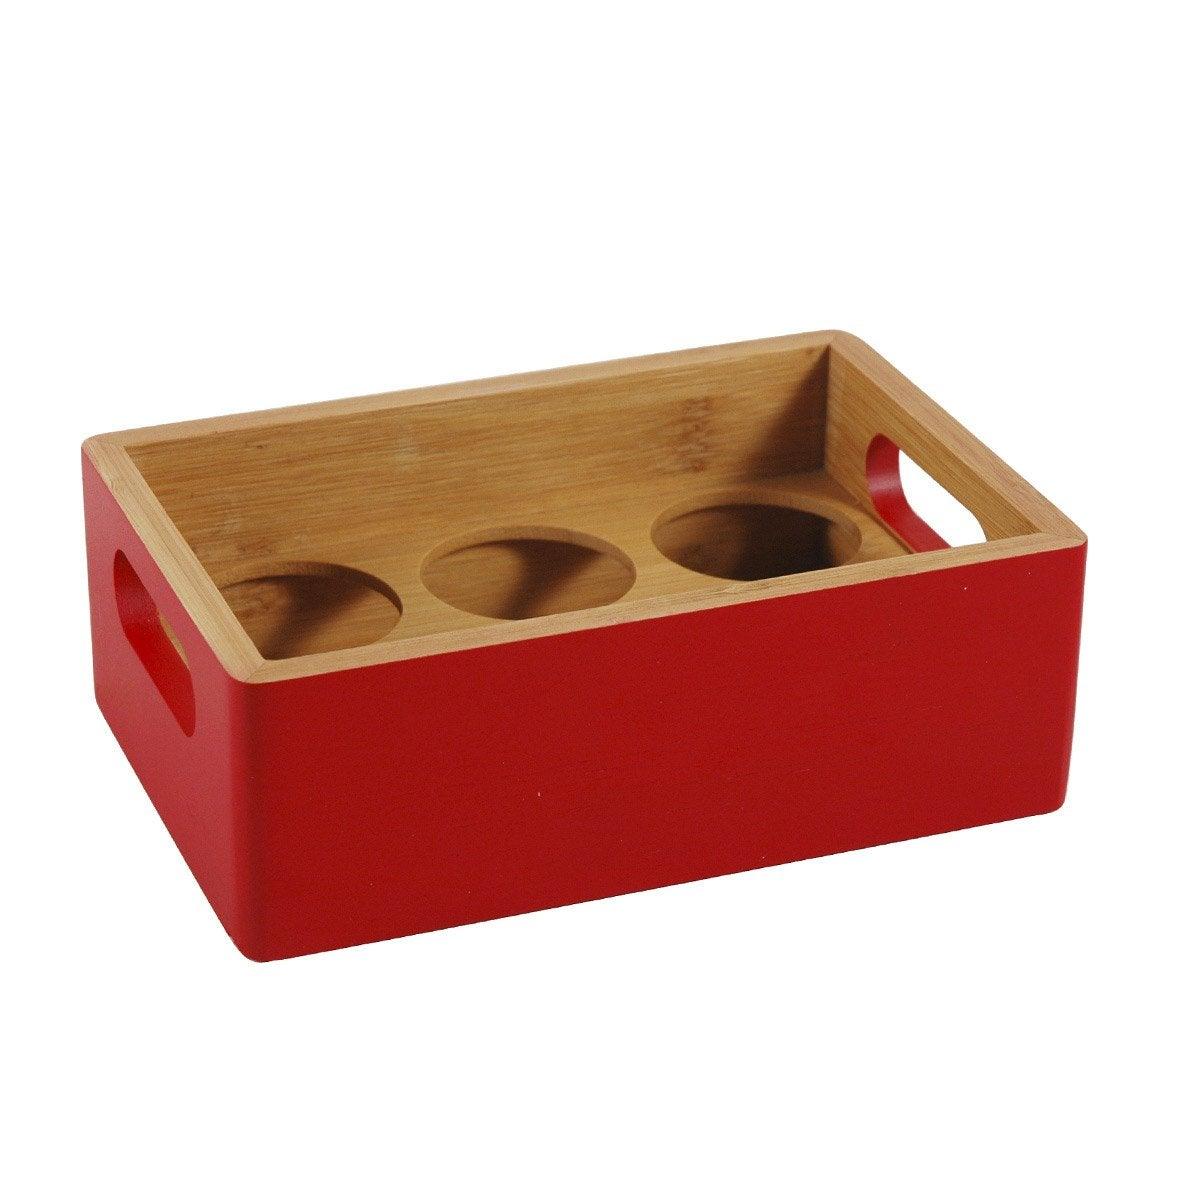 Porte-épices bambou rouge-rouge n°3